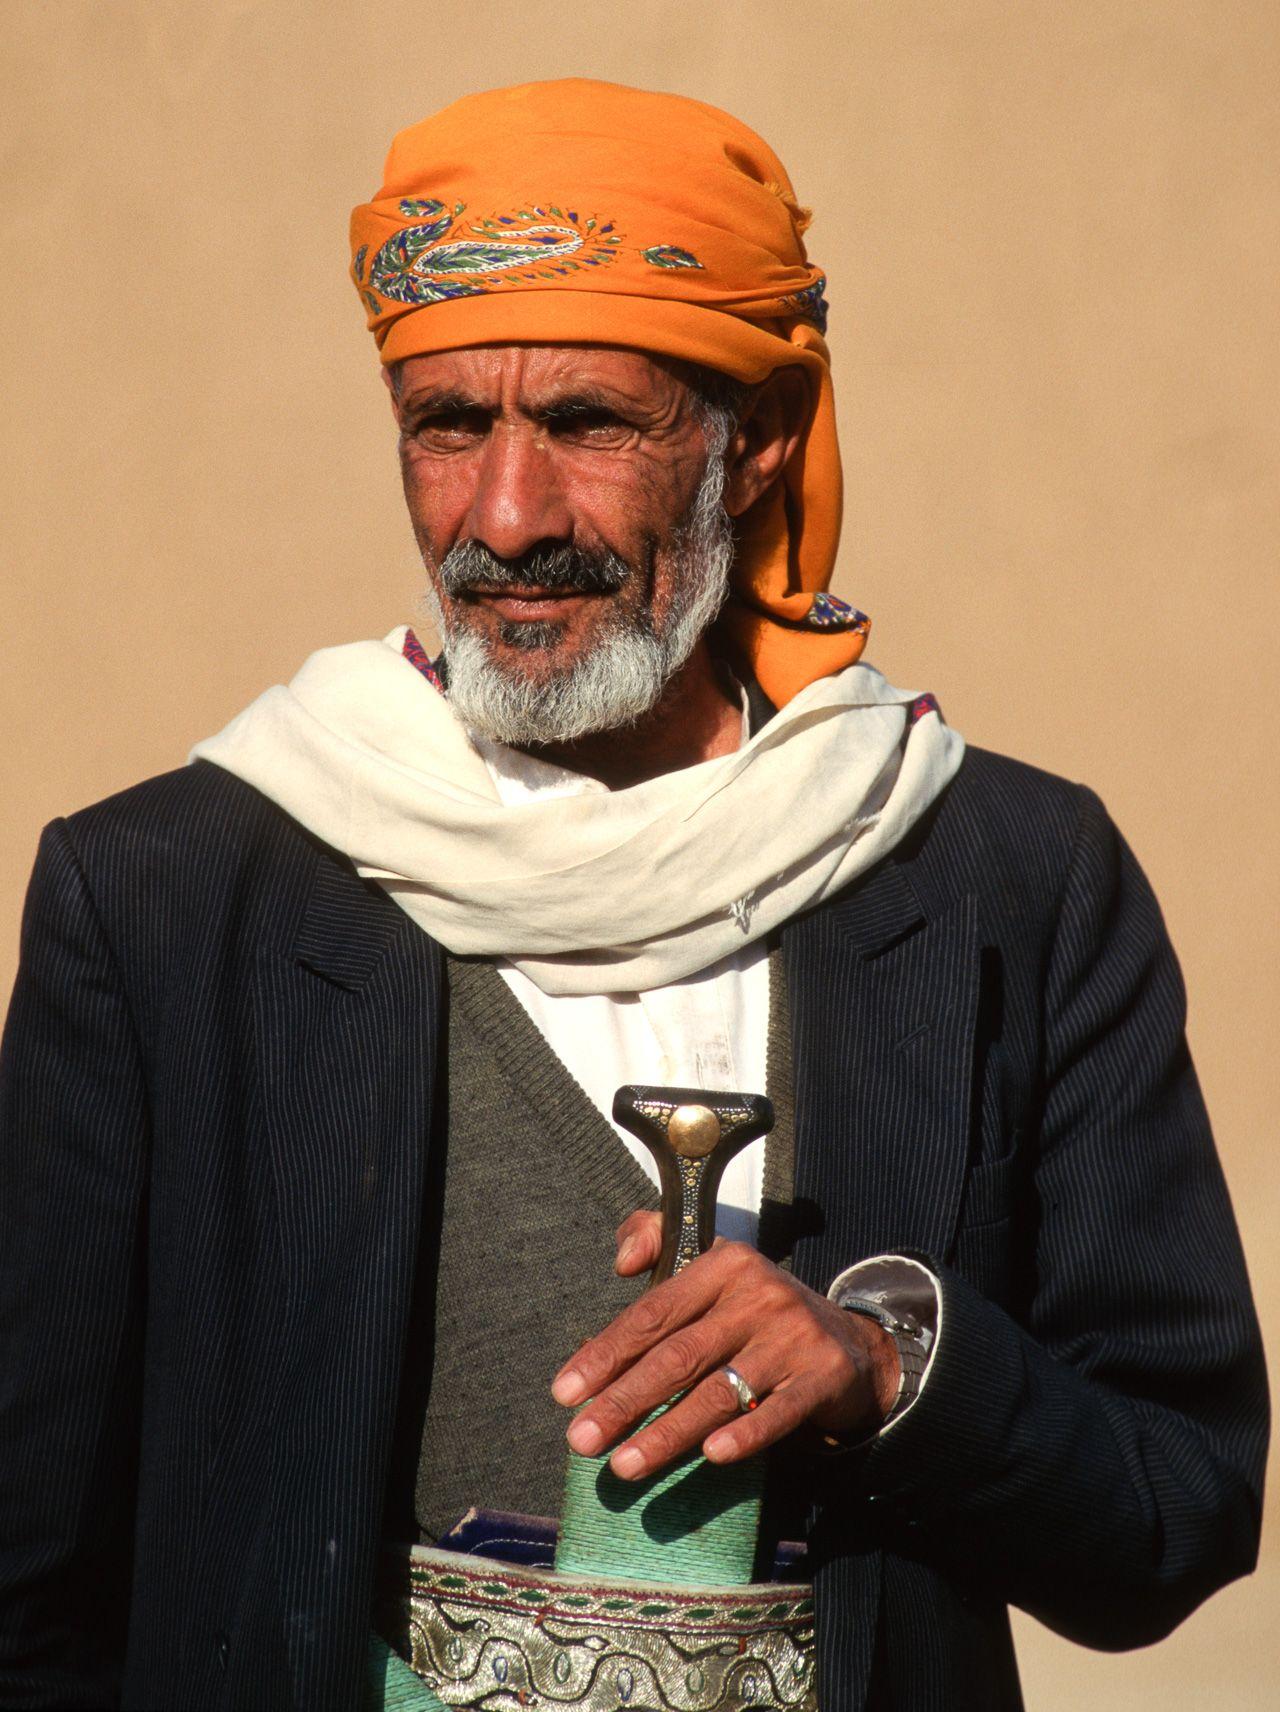 Gentleman from Sana'a. Yemen